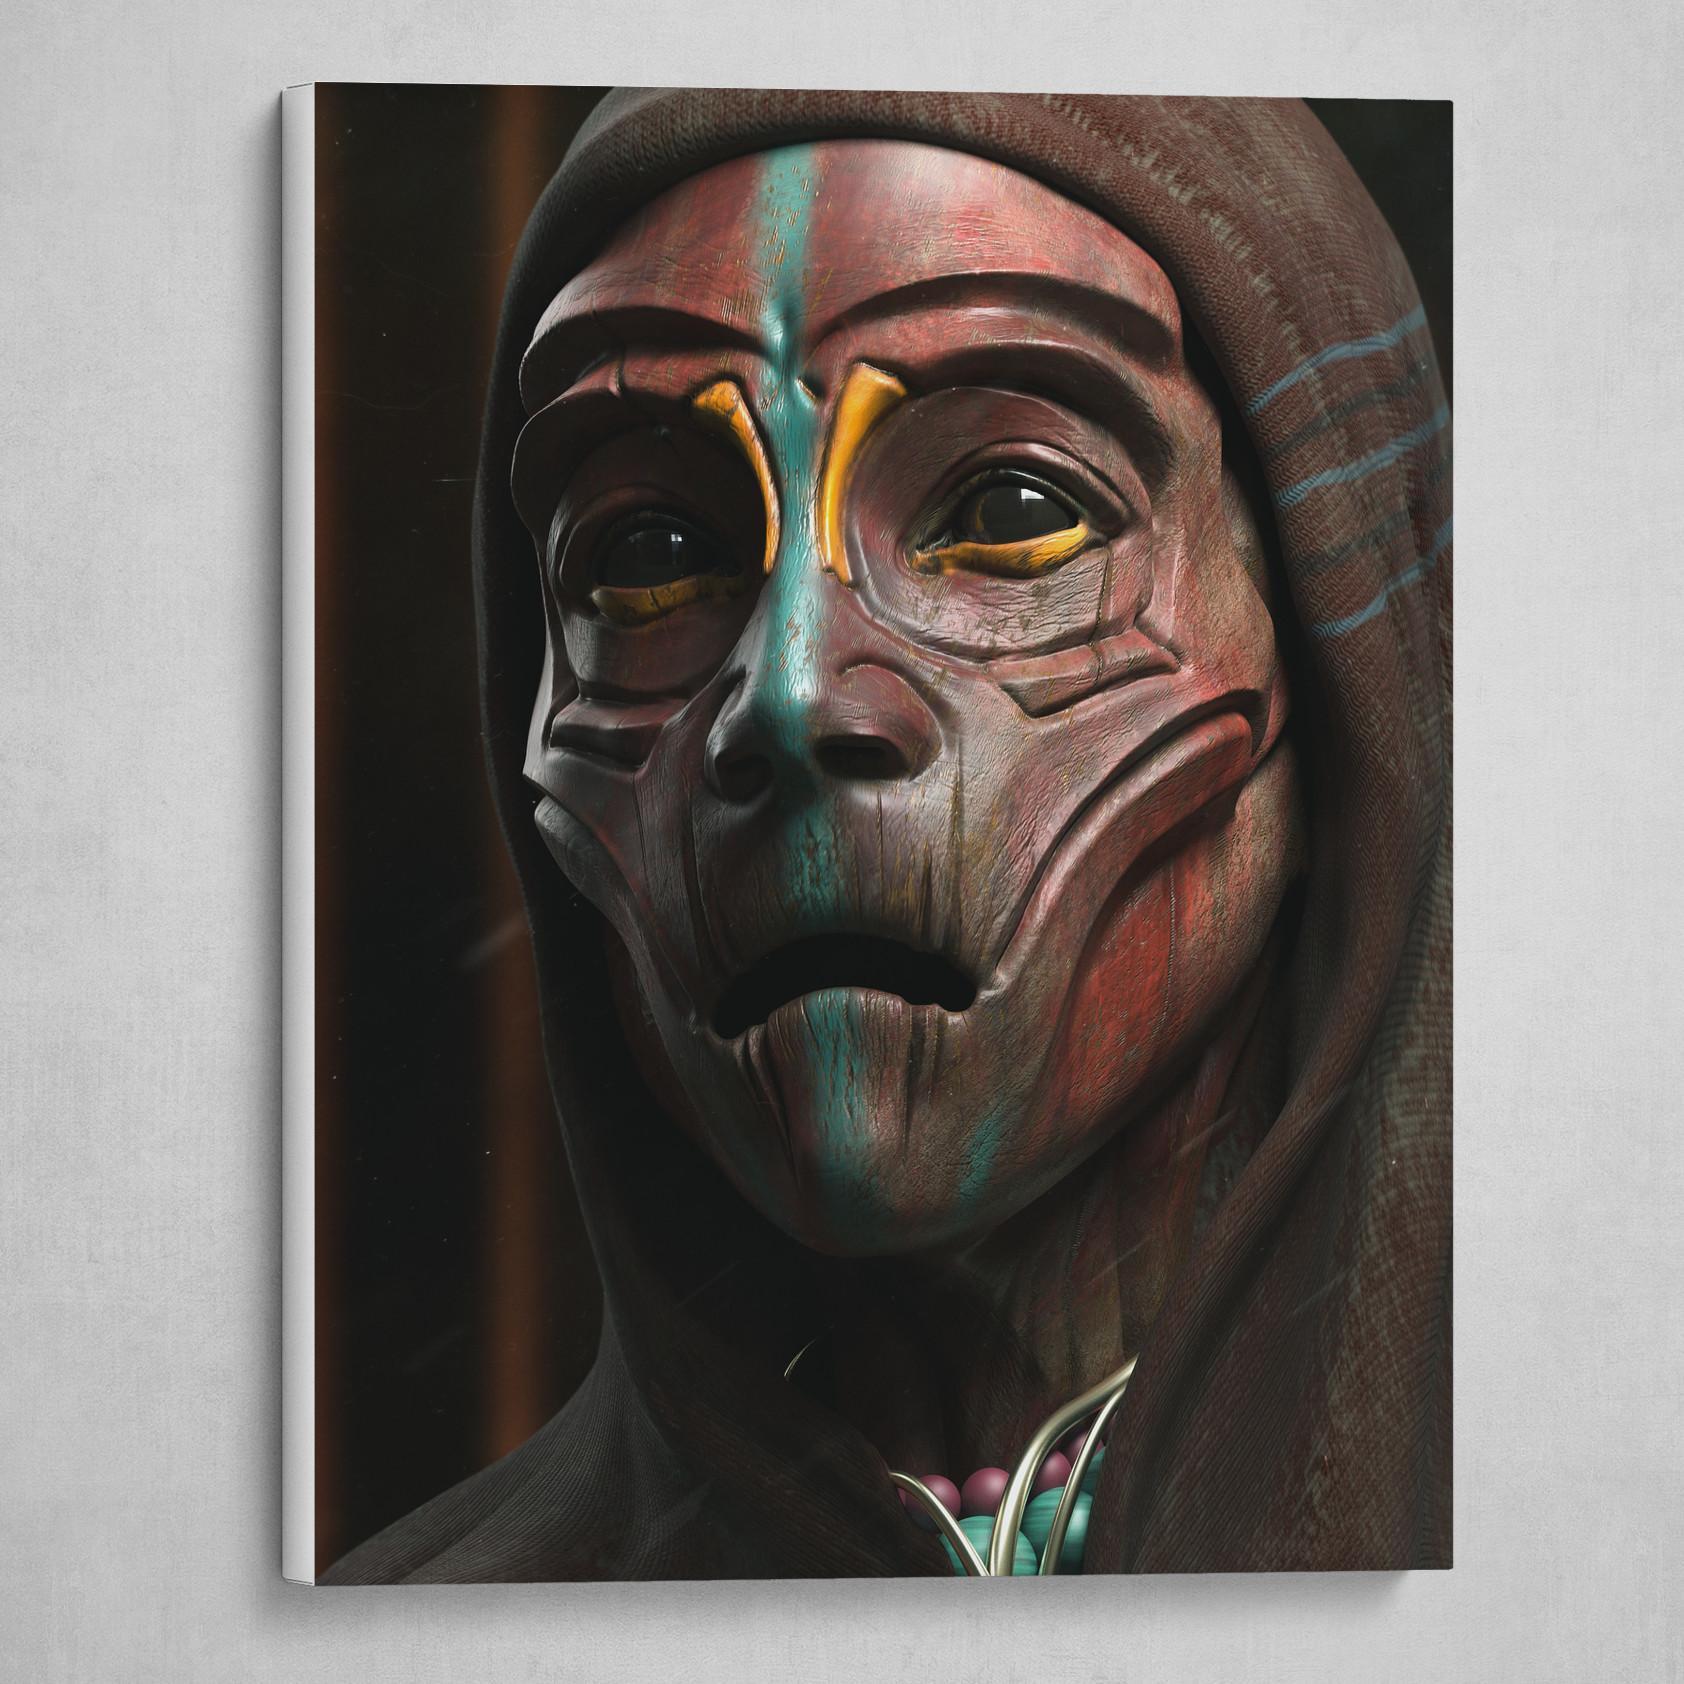 PREMIUM GICLEE CANVAS ART MUSE